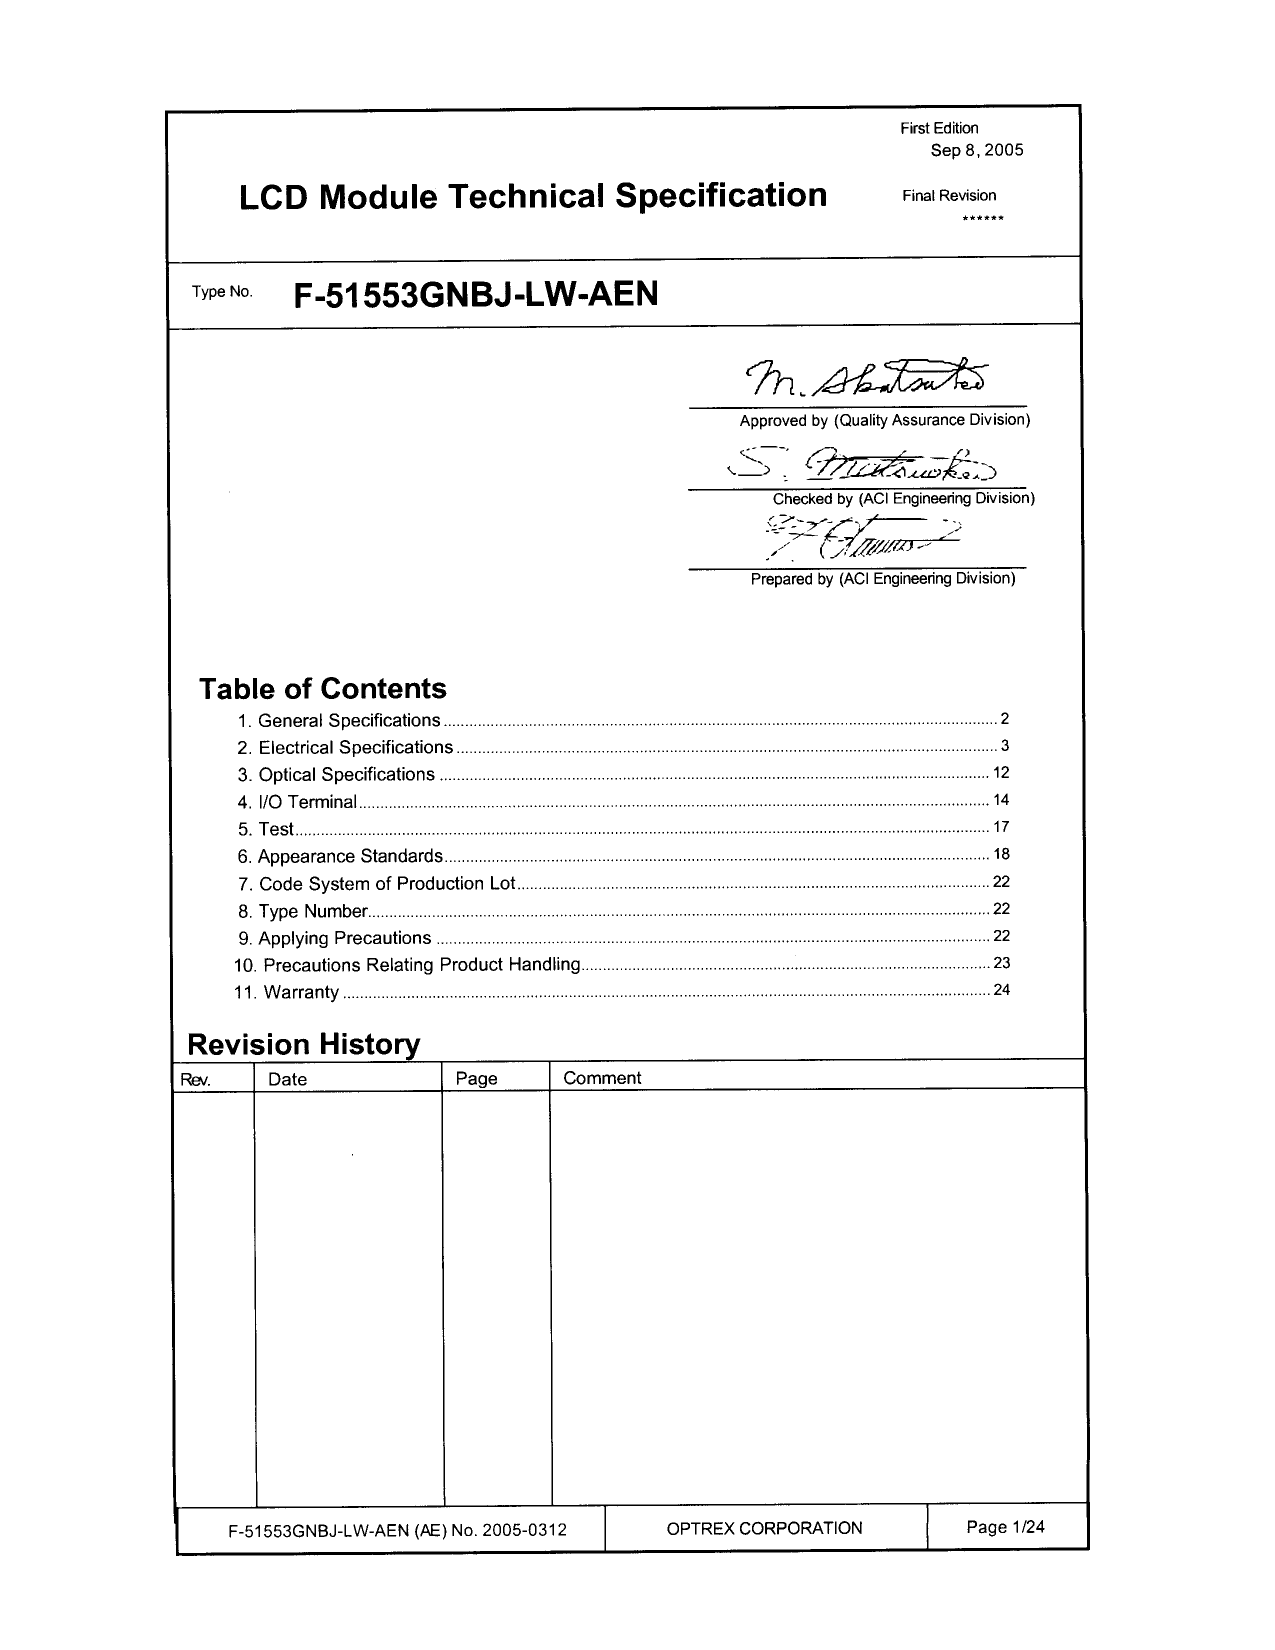 F-51553GNBJ-LW-AEN دیتاشیت PDF